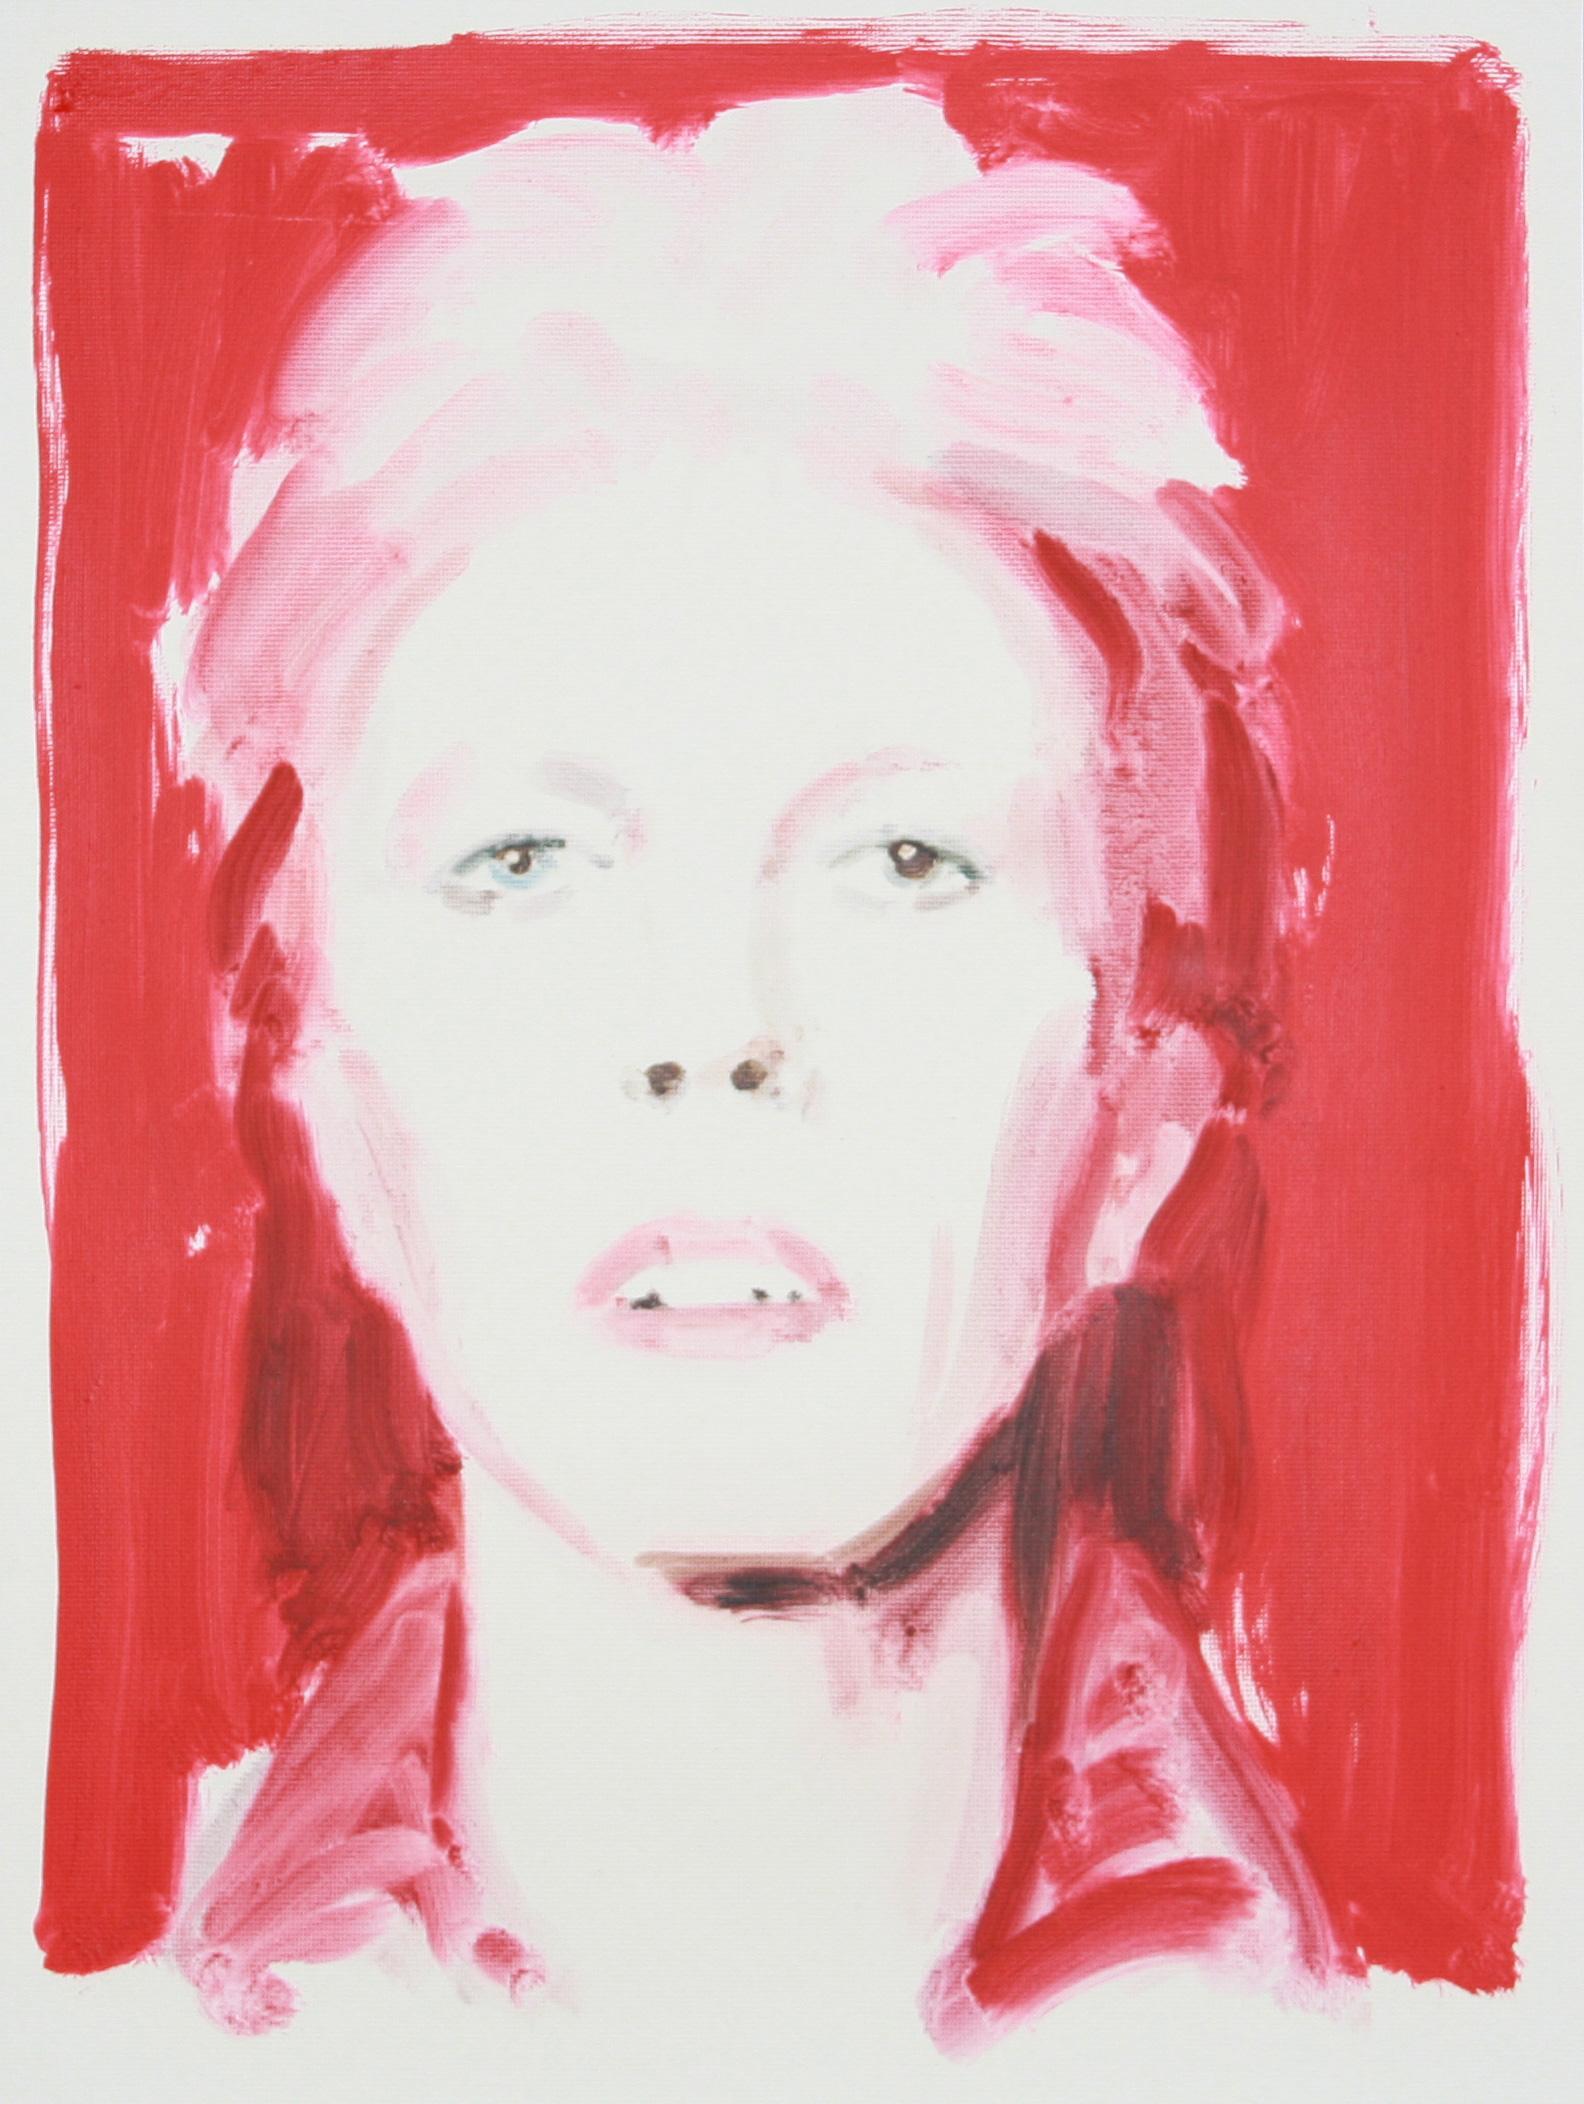 David Bowie by Annie Kevans